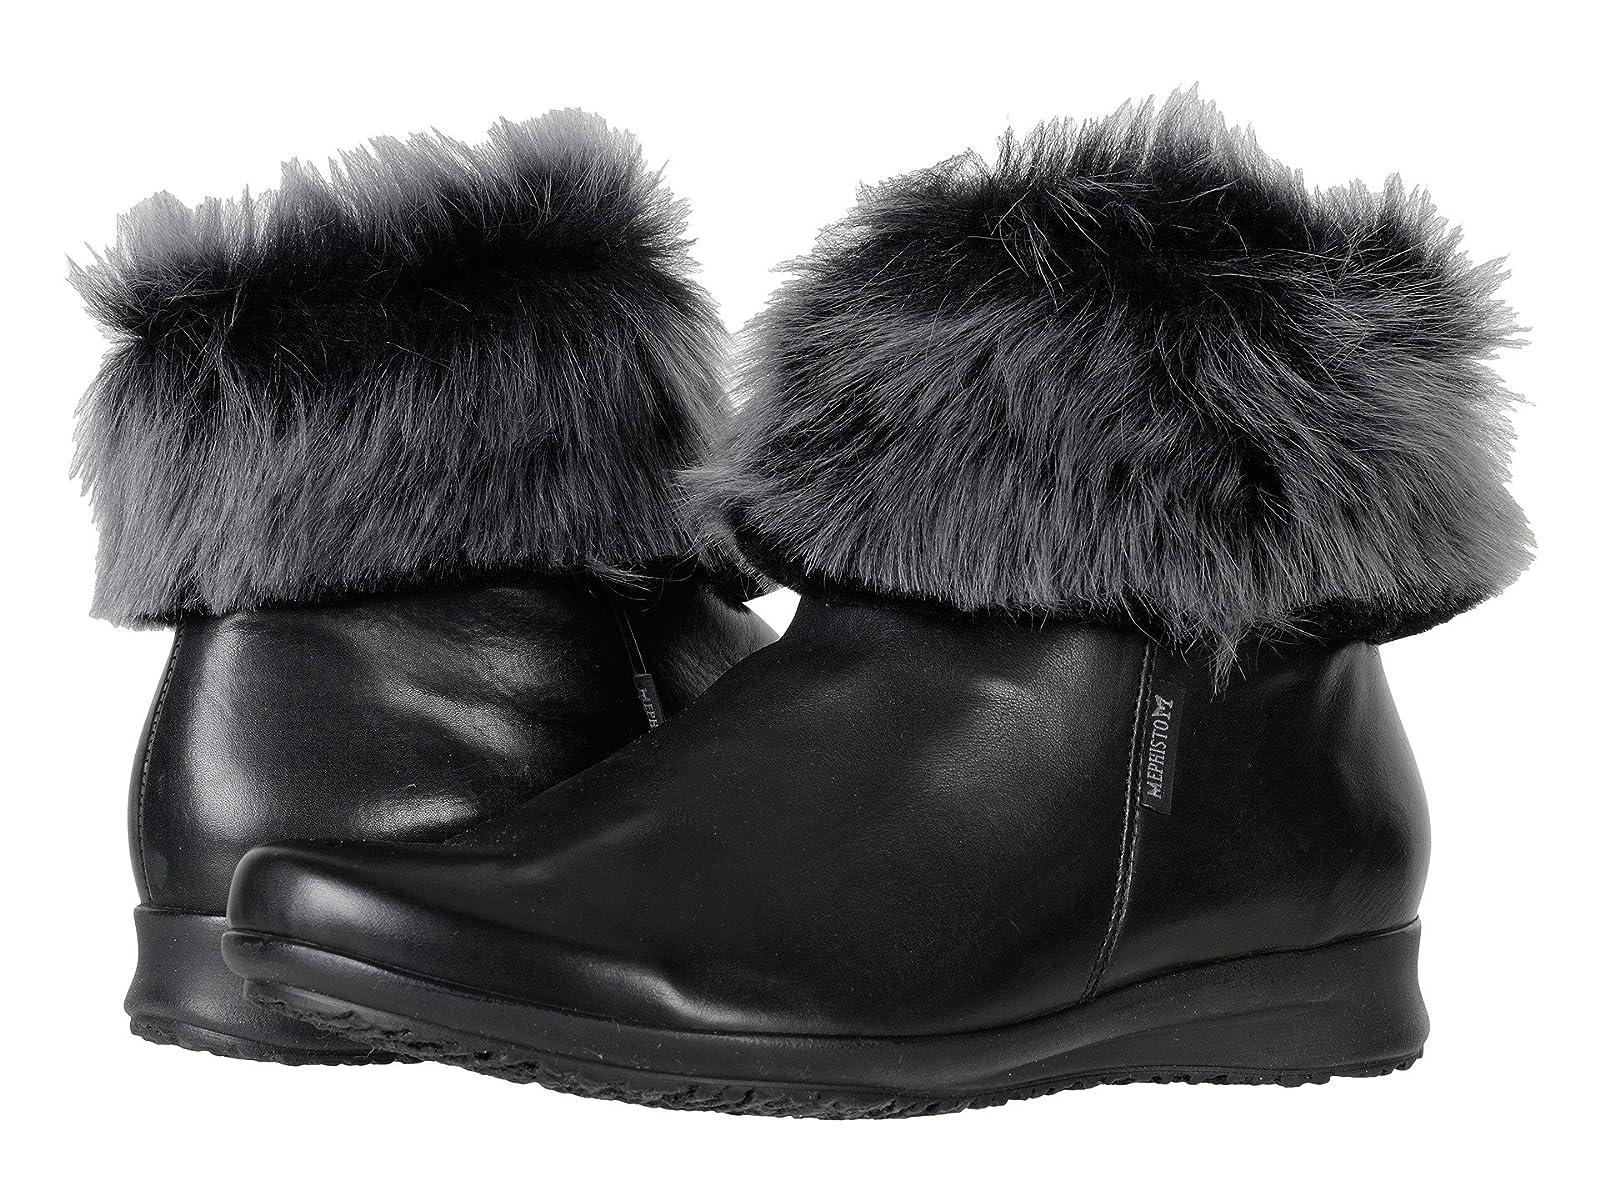 Mephisto Fiducia WinterCheap and distinctive eye-catching shoes